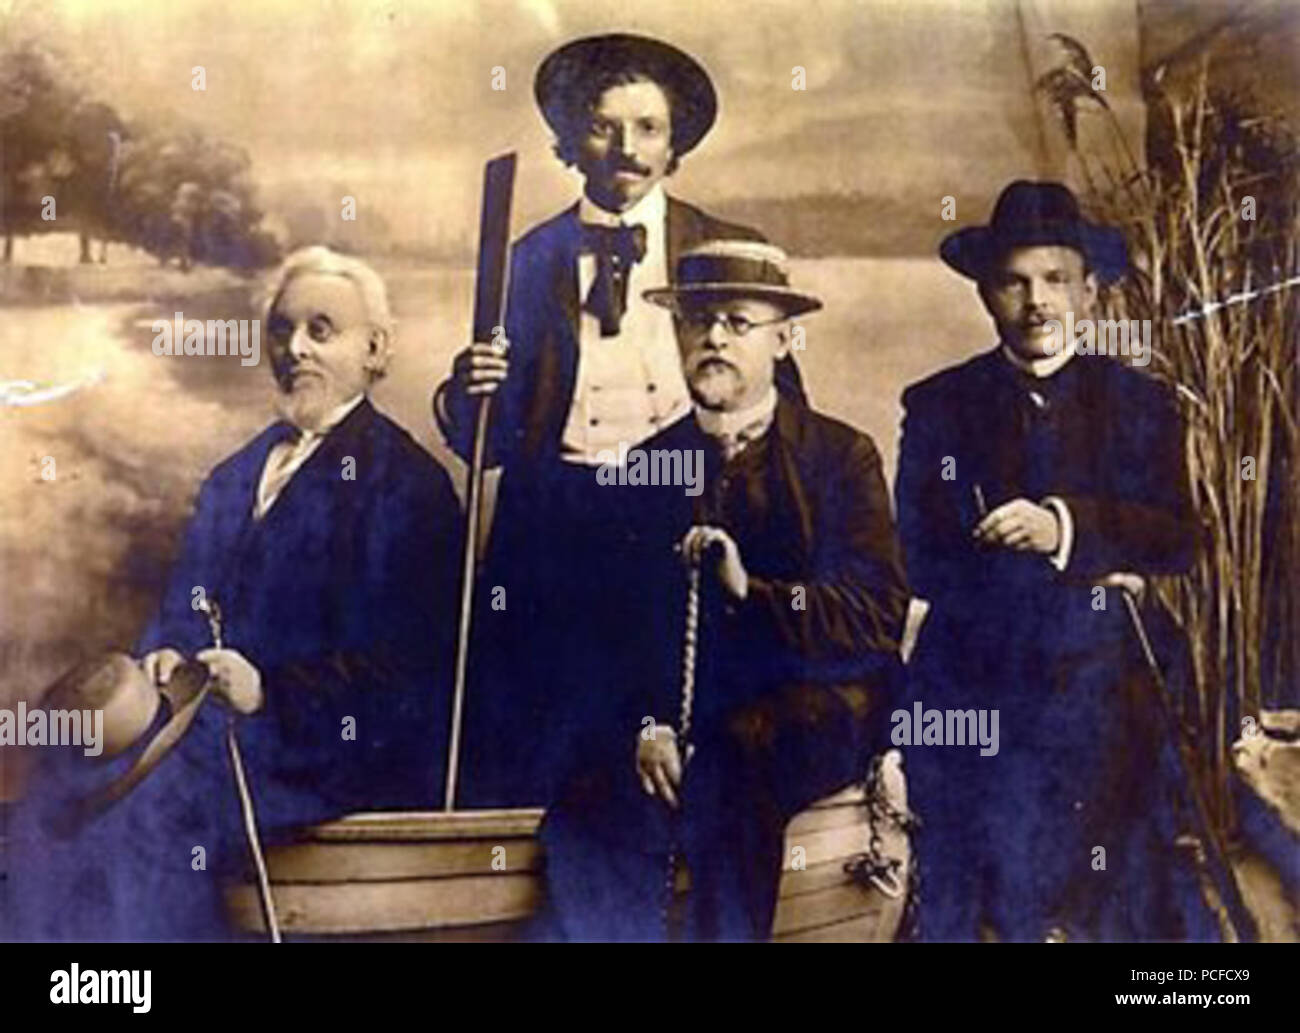 412 Mendele Mos Sholem Aleichem Ben-Ami Bialik Odessa 1910 - Stock Image